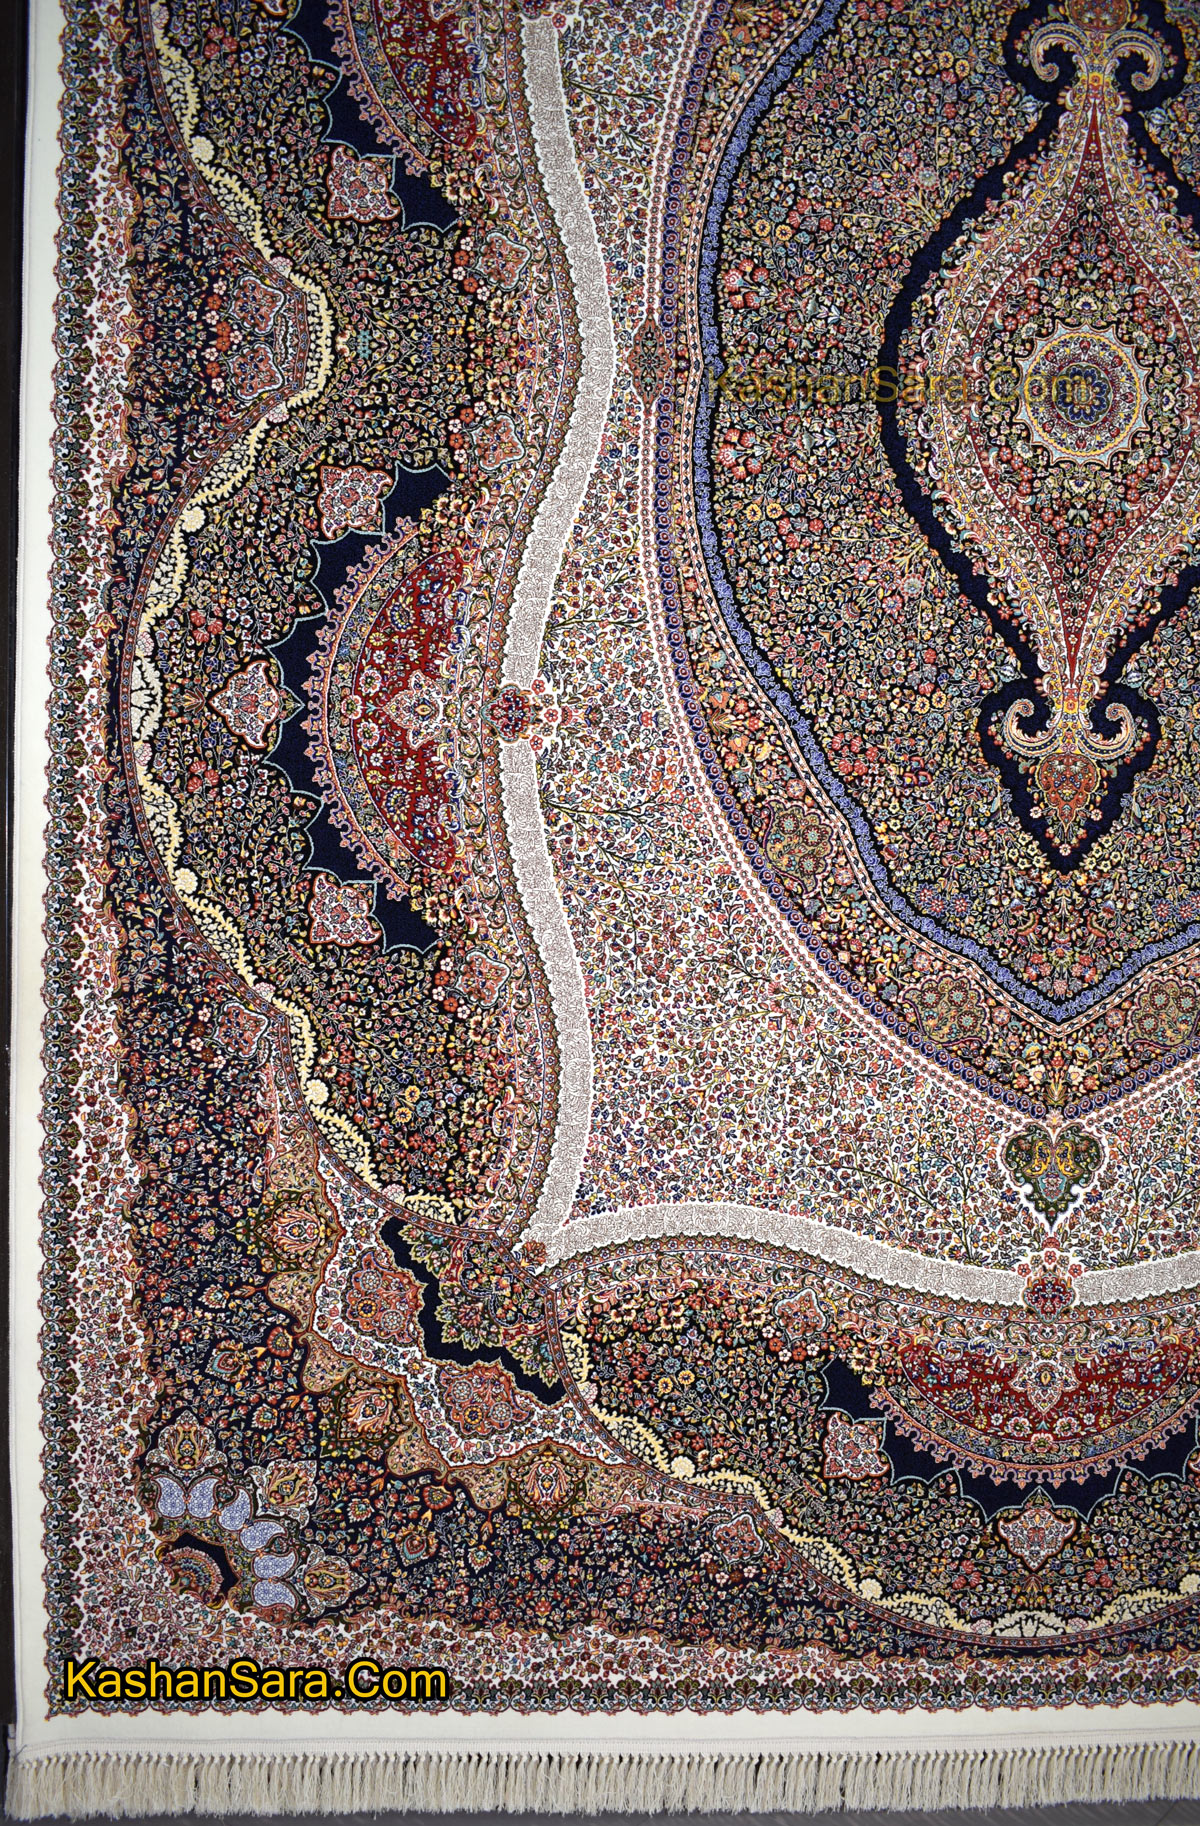 قیمت فرش ۱۰۰۰ شانه طرح سپنتا